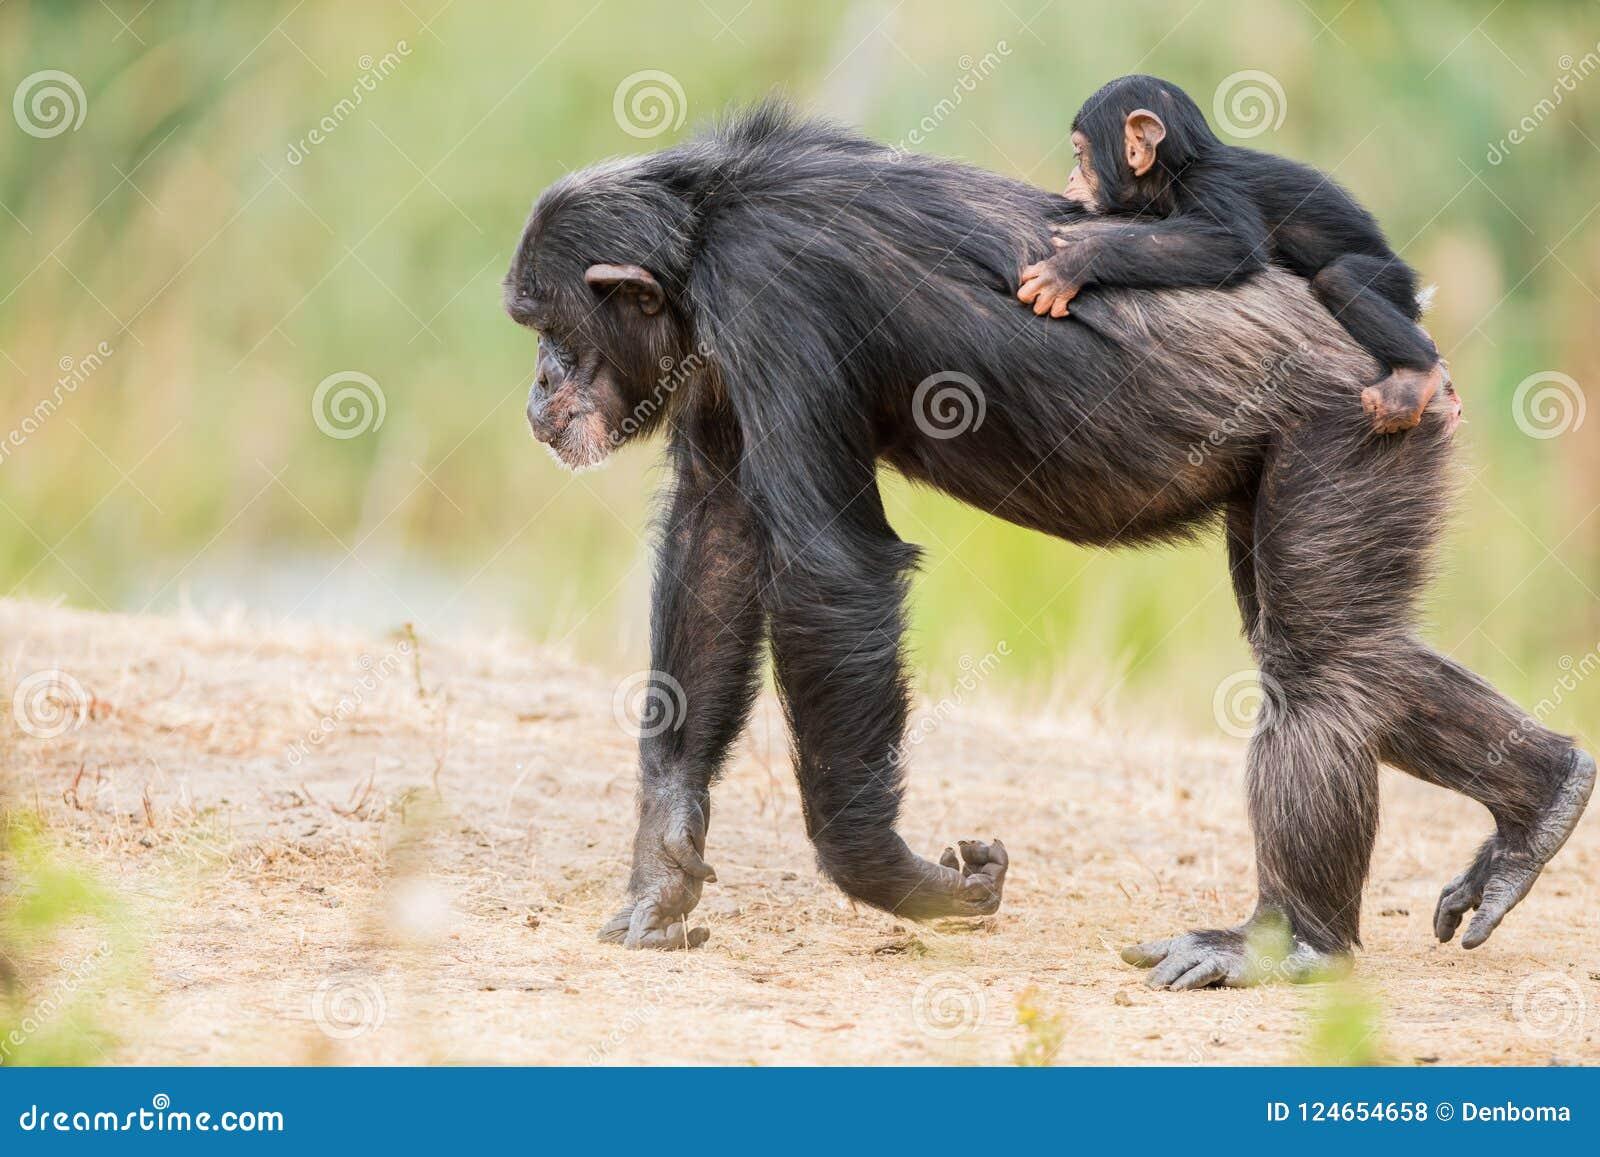 Common chimpanzee with a baby chimpanzee